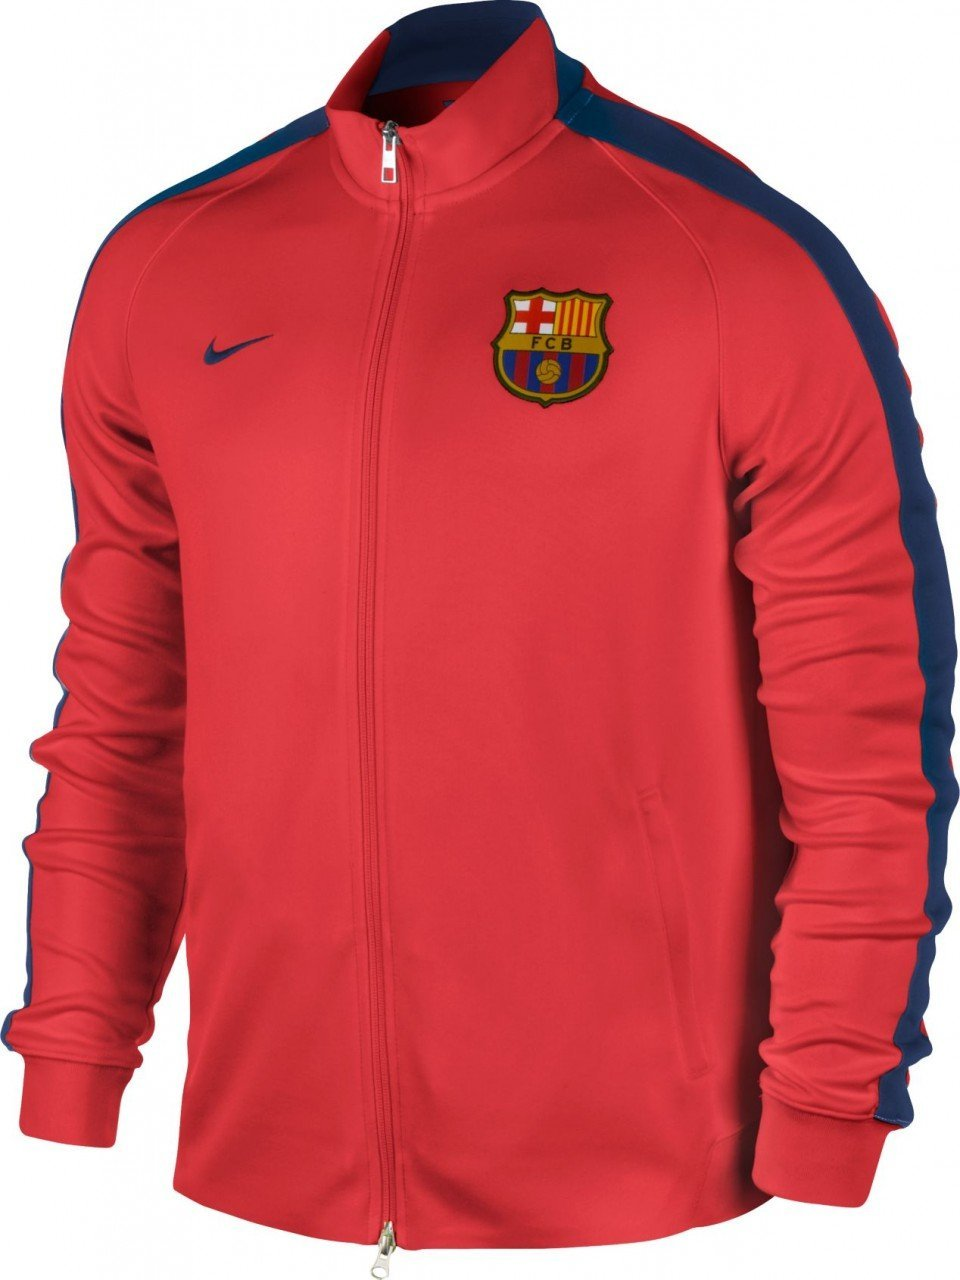 sale retailer 28533 17b0a Nike FC Barcelona N98 Authentic Jacket, Crimson Loyal